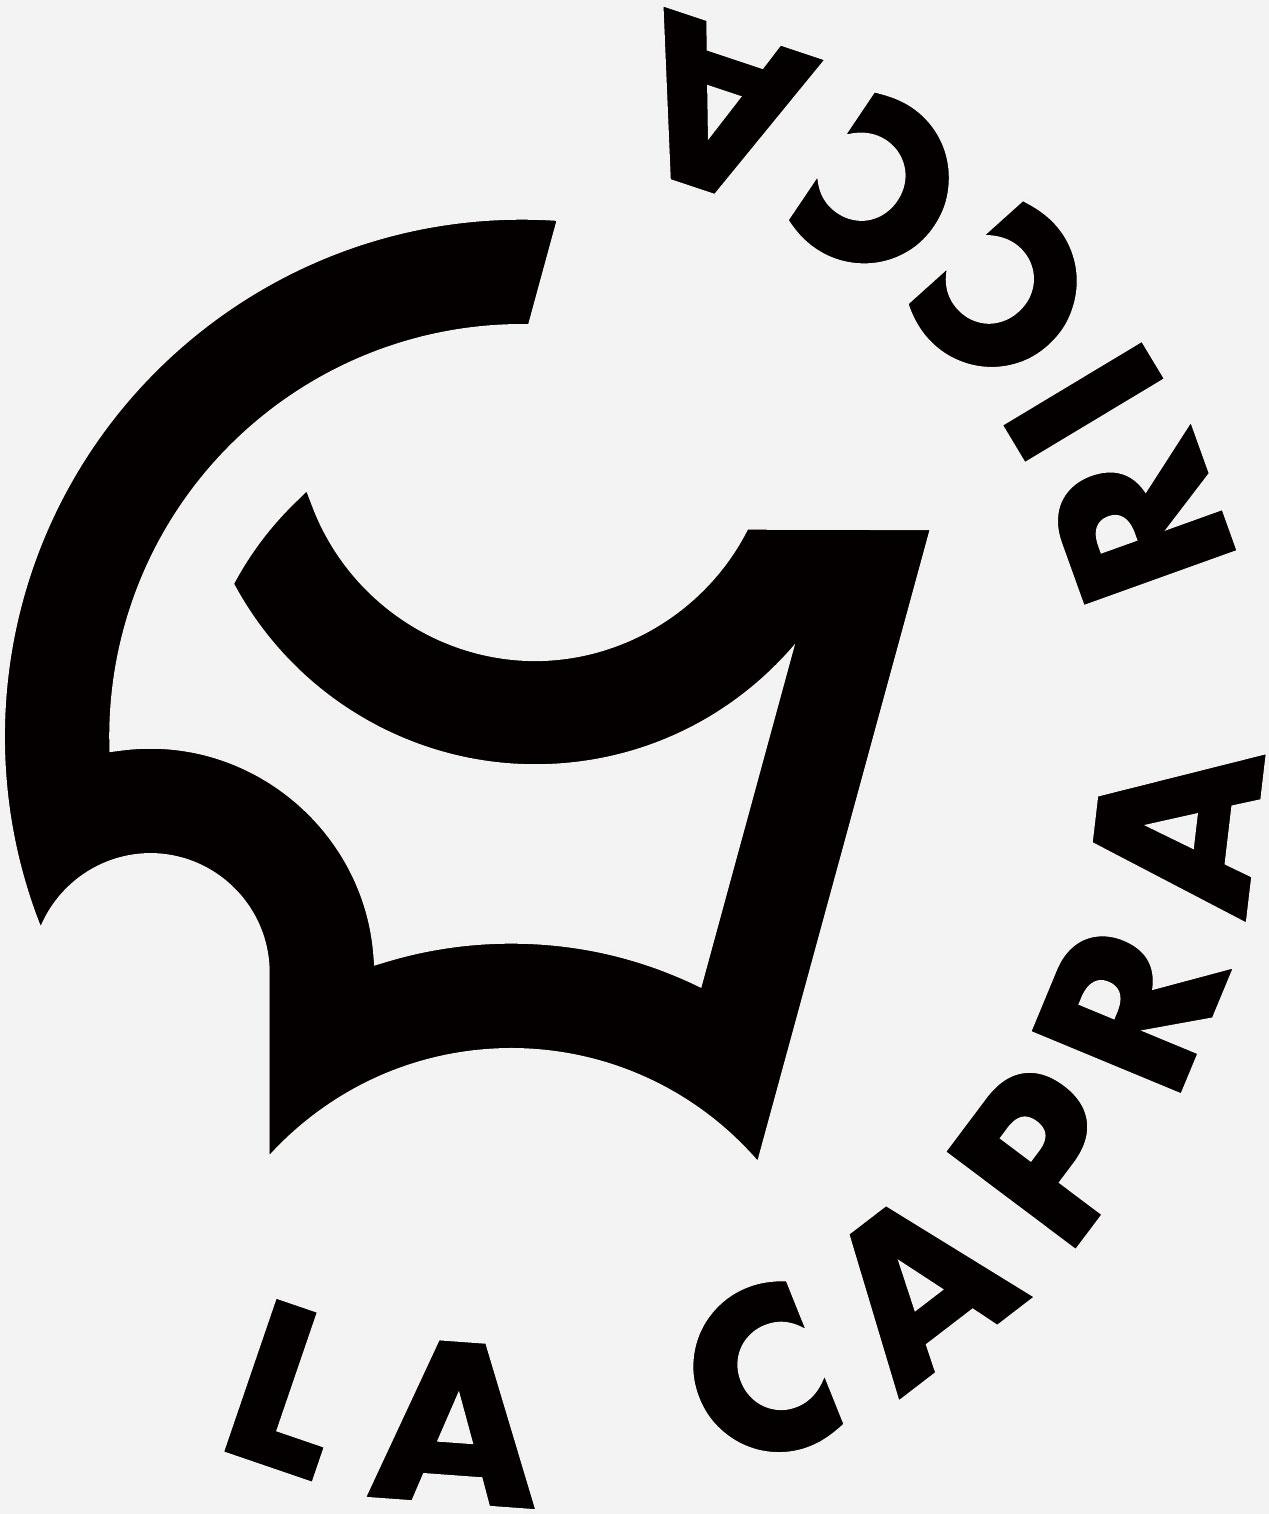 lacaprariccalogo